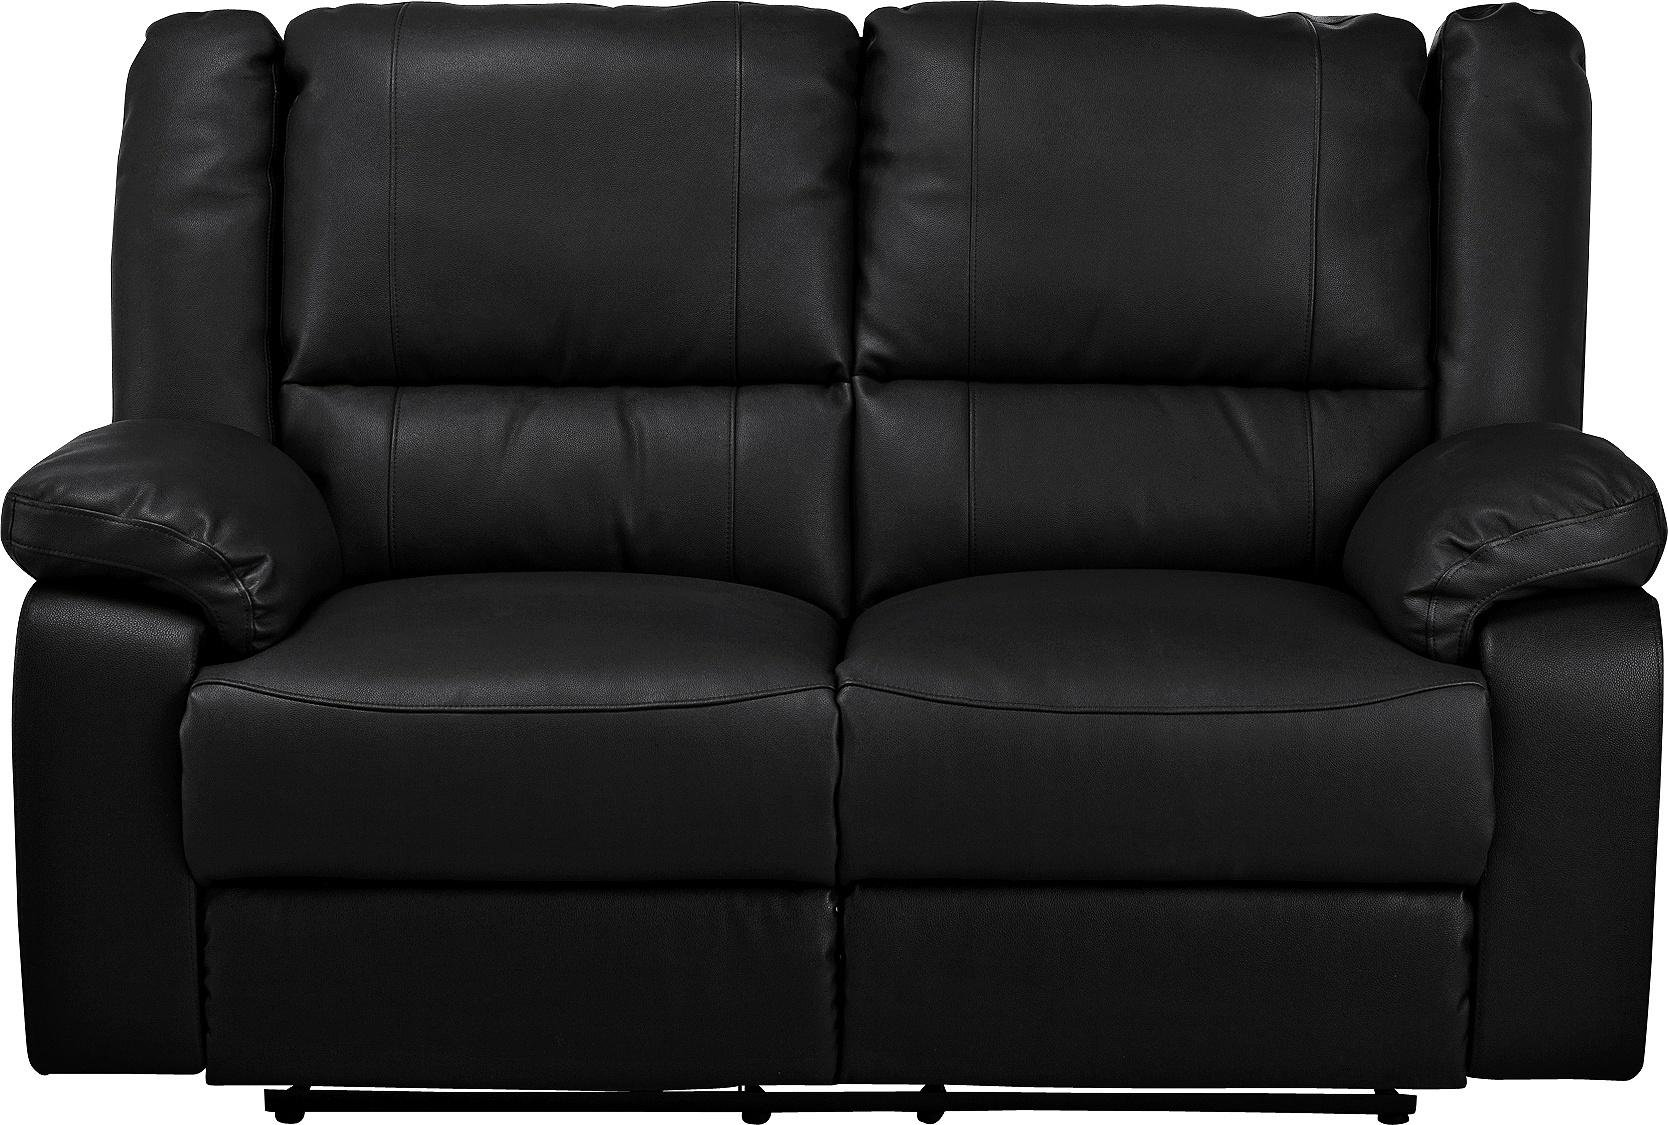 Buy Argos Home Bruno 2 Seater Manual Recliner Sofa Black Sofas